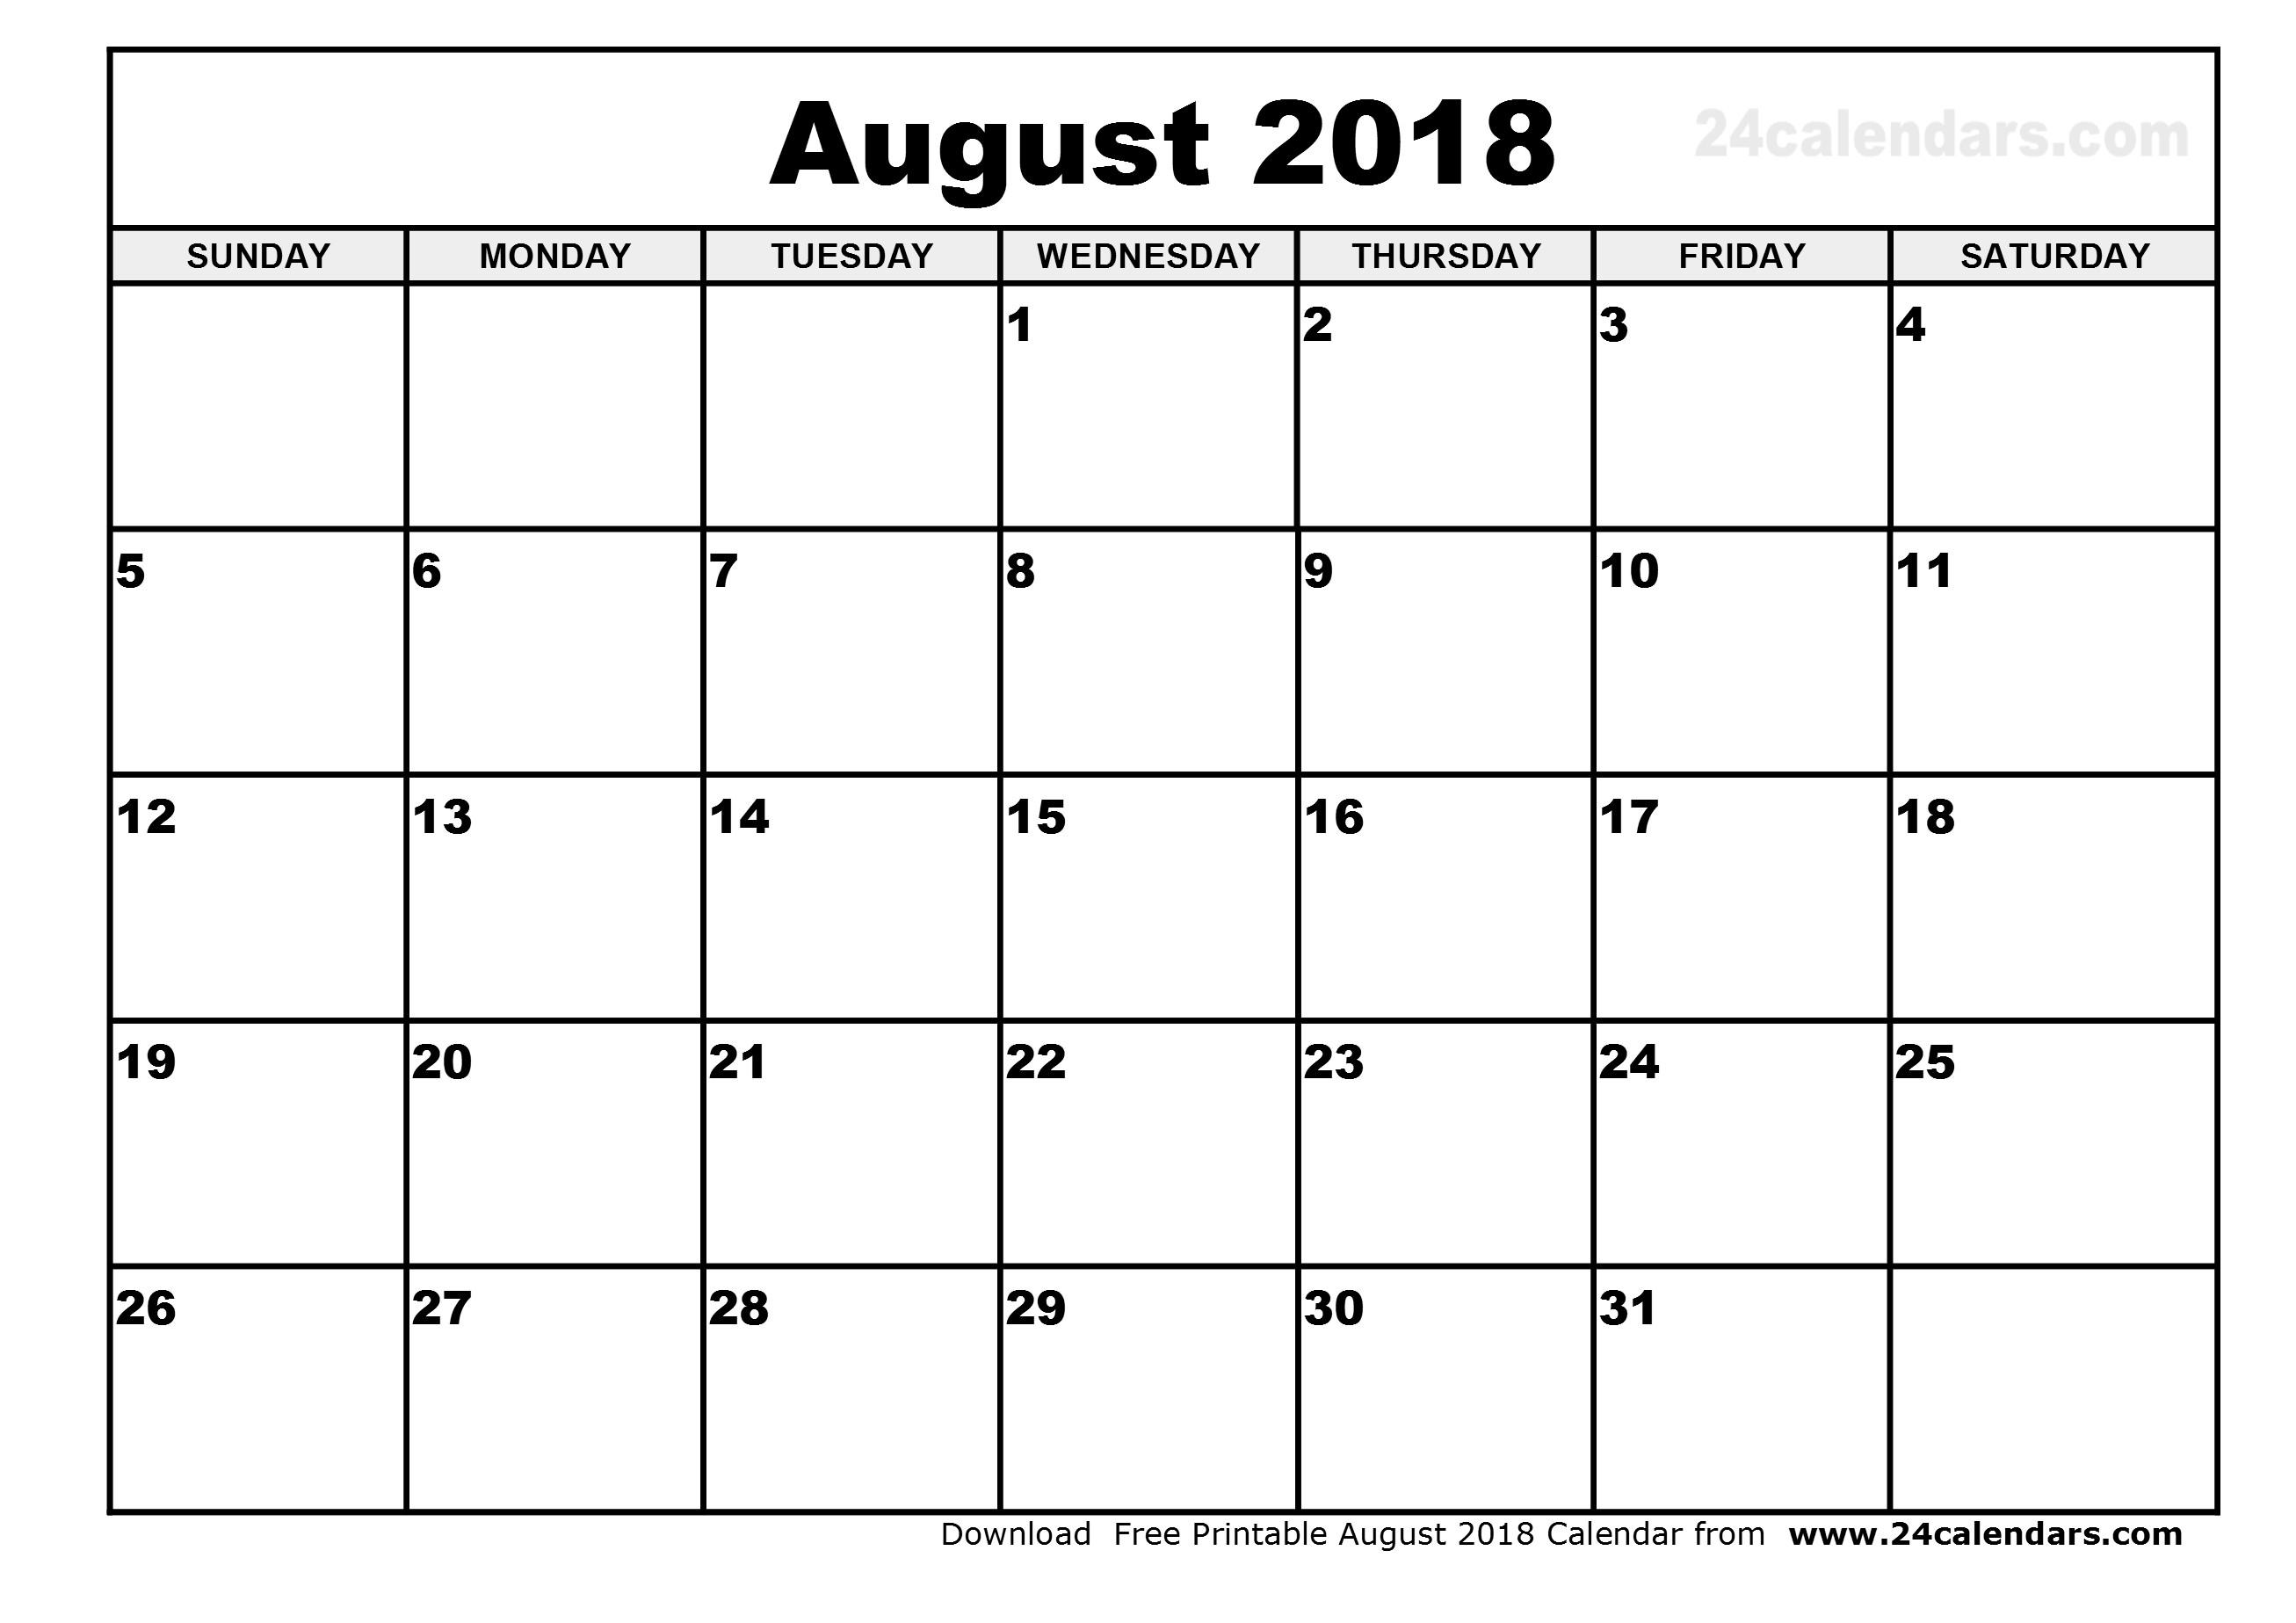 Desktop Wallpapers Calendar August 2018 (47+ Pictures) Inside The Walking Dead Calendar Template